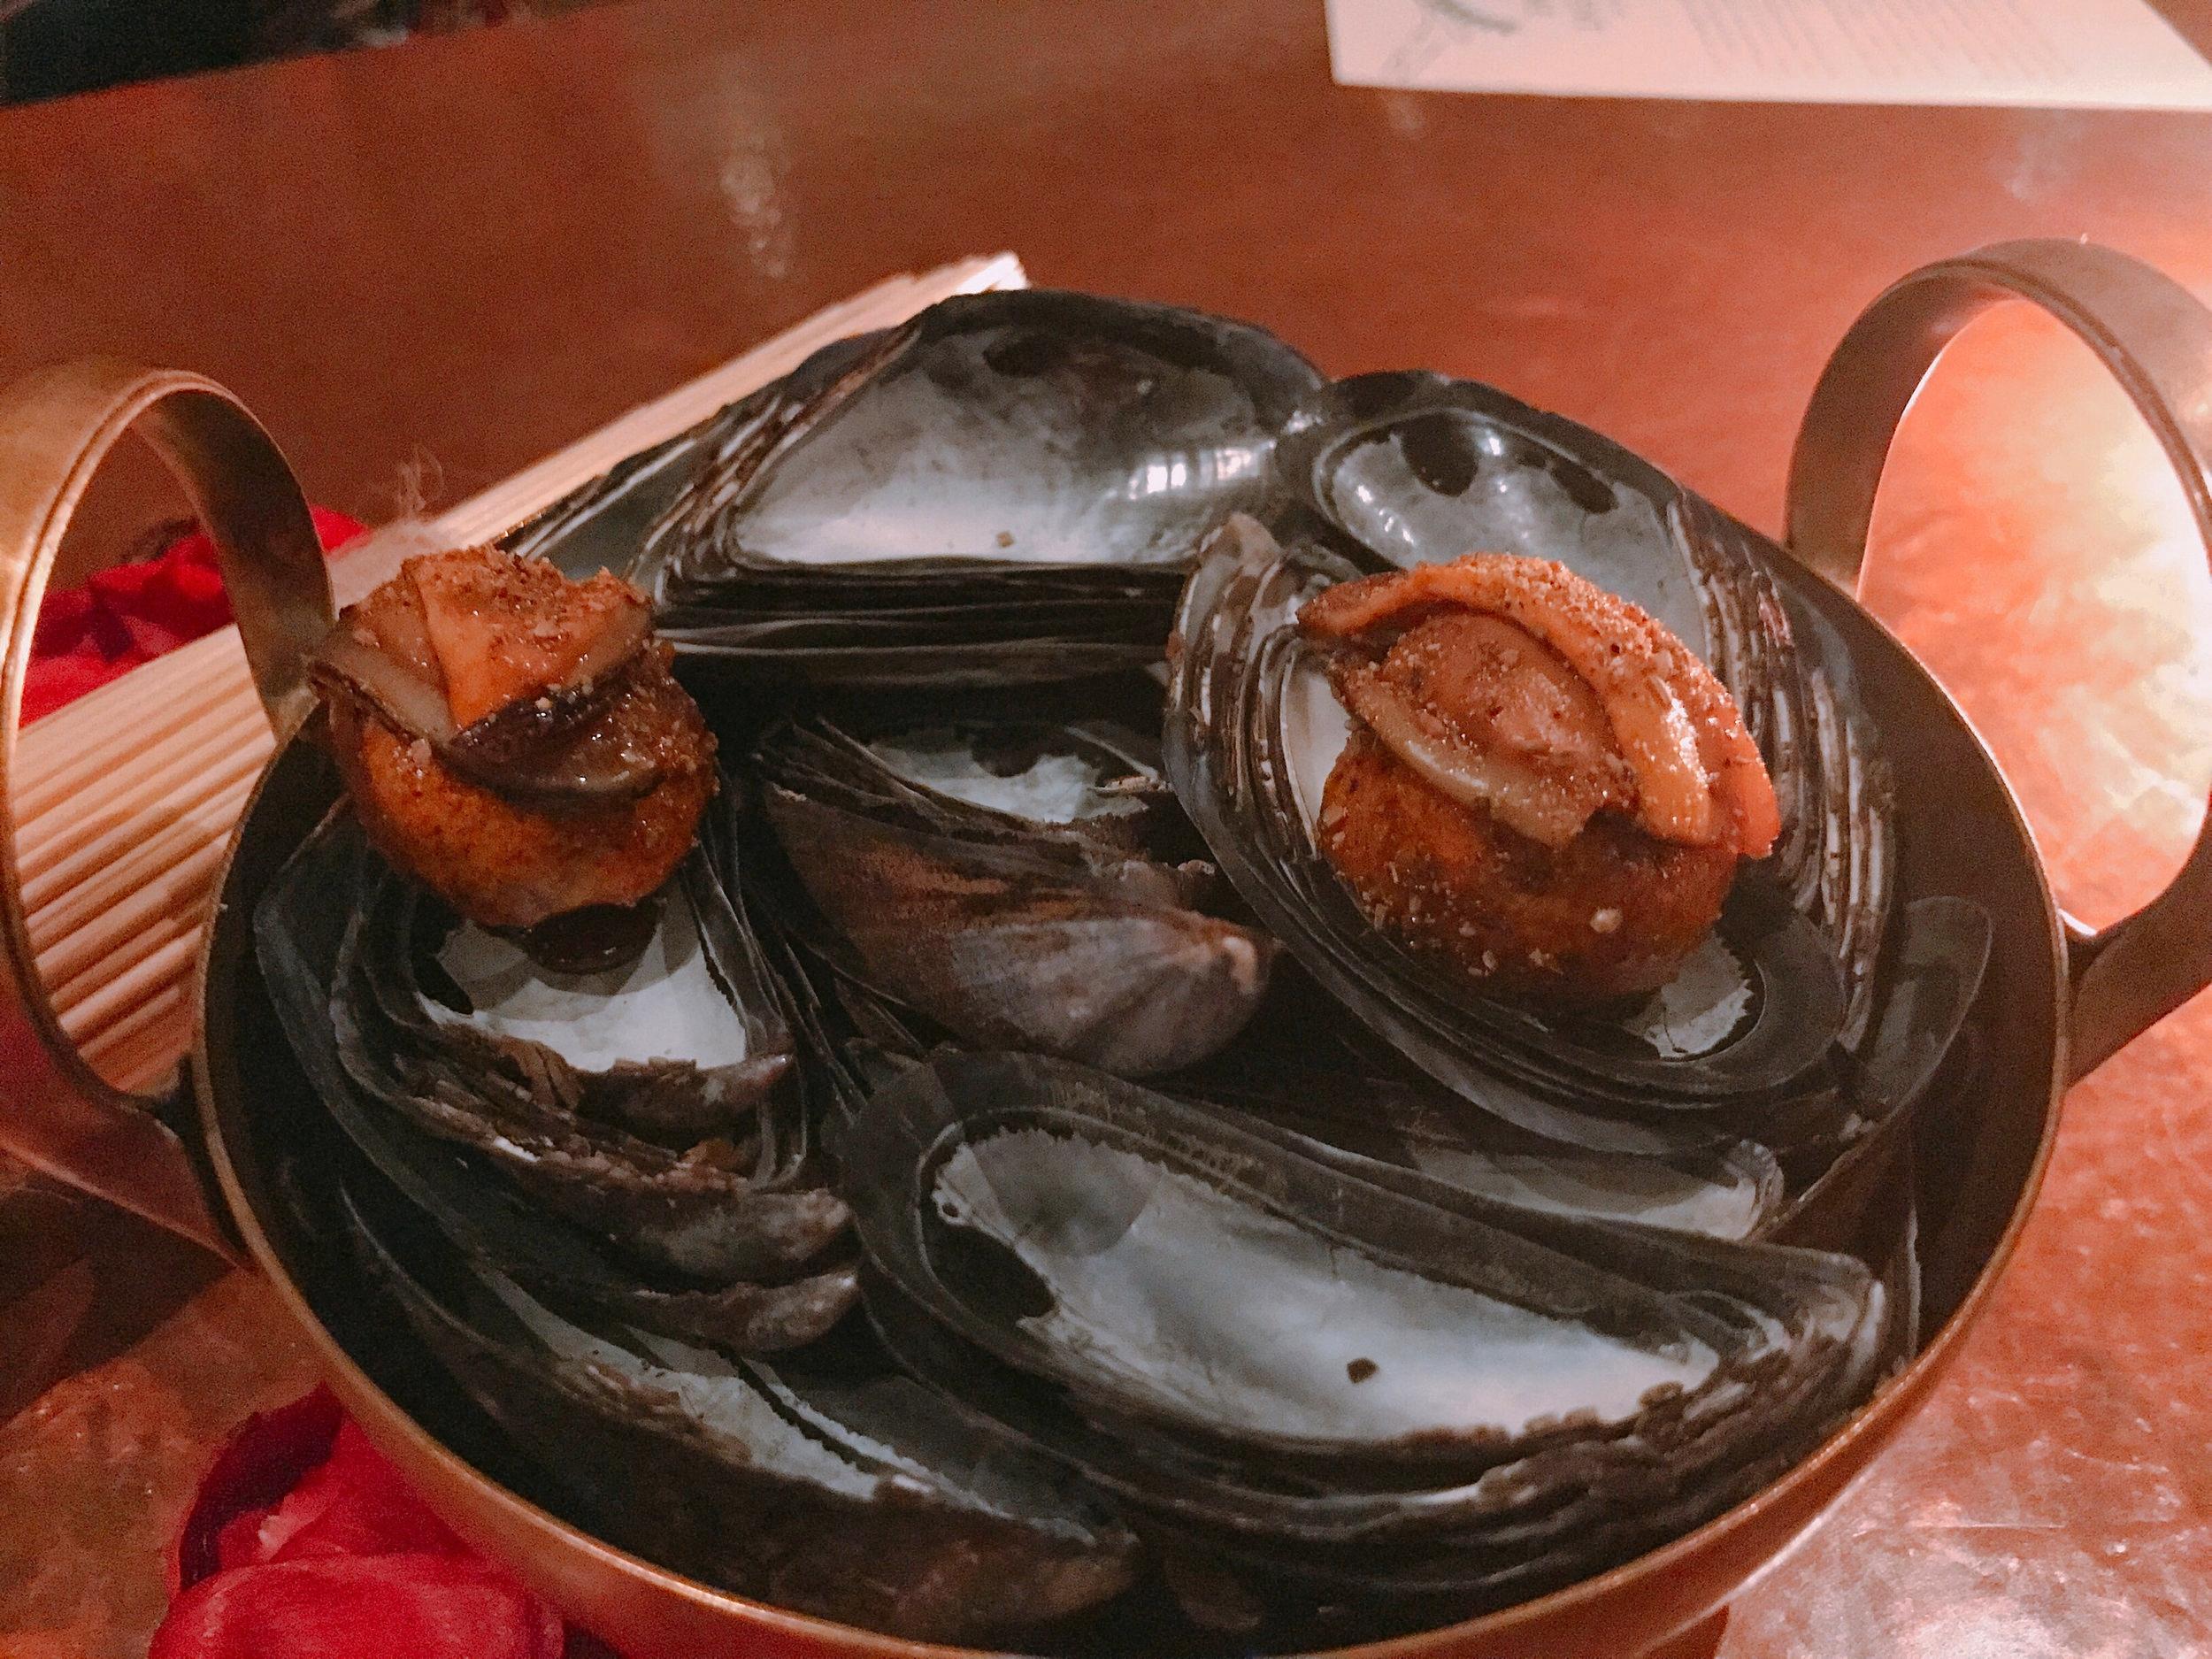 Isicia Ex Sphondylis (42): Mussels, Saffron, Lardo